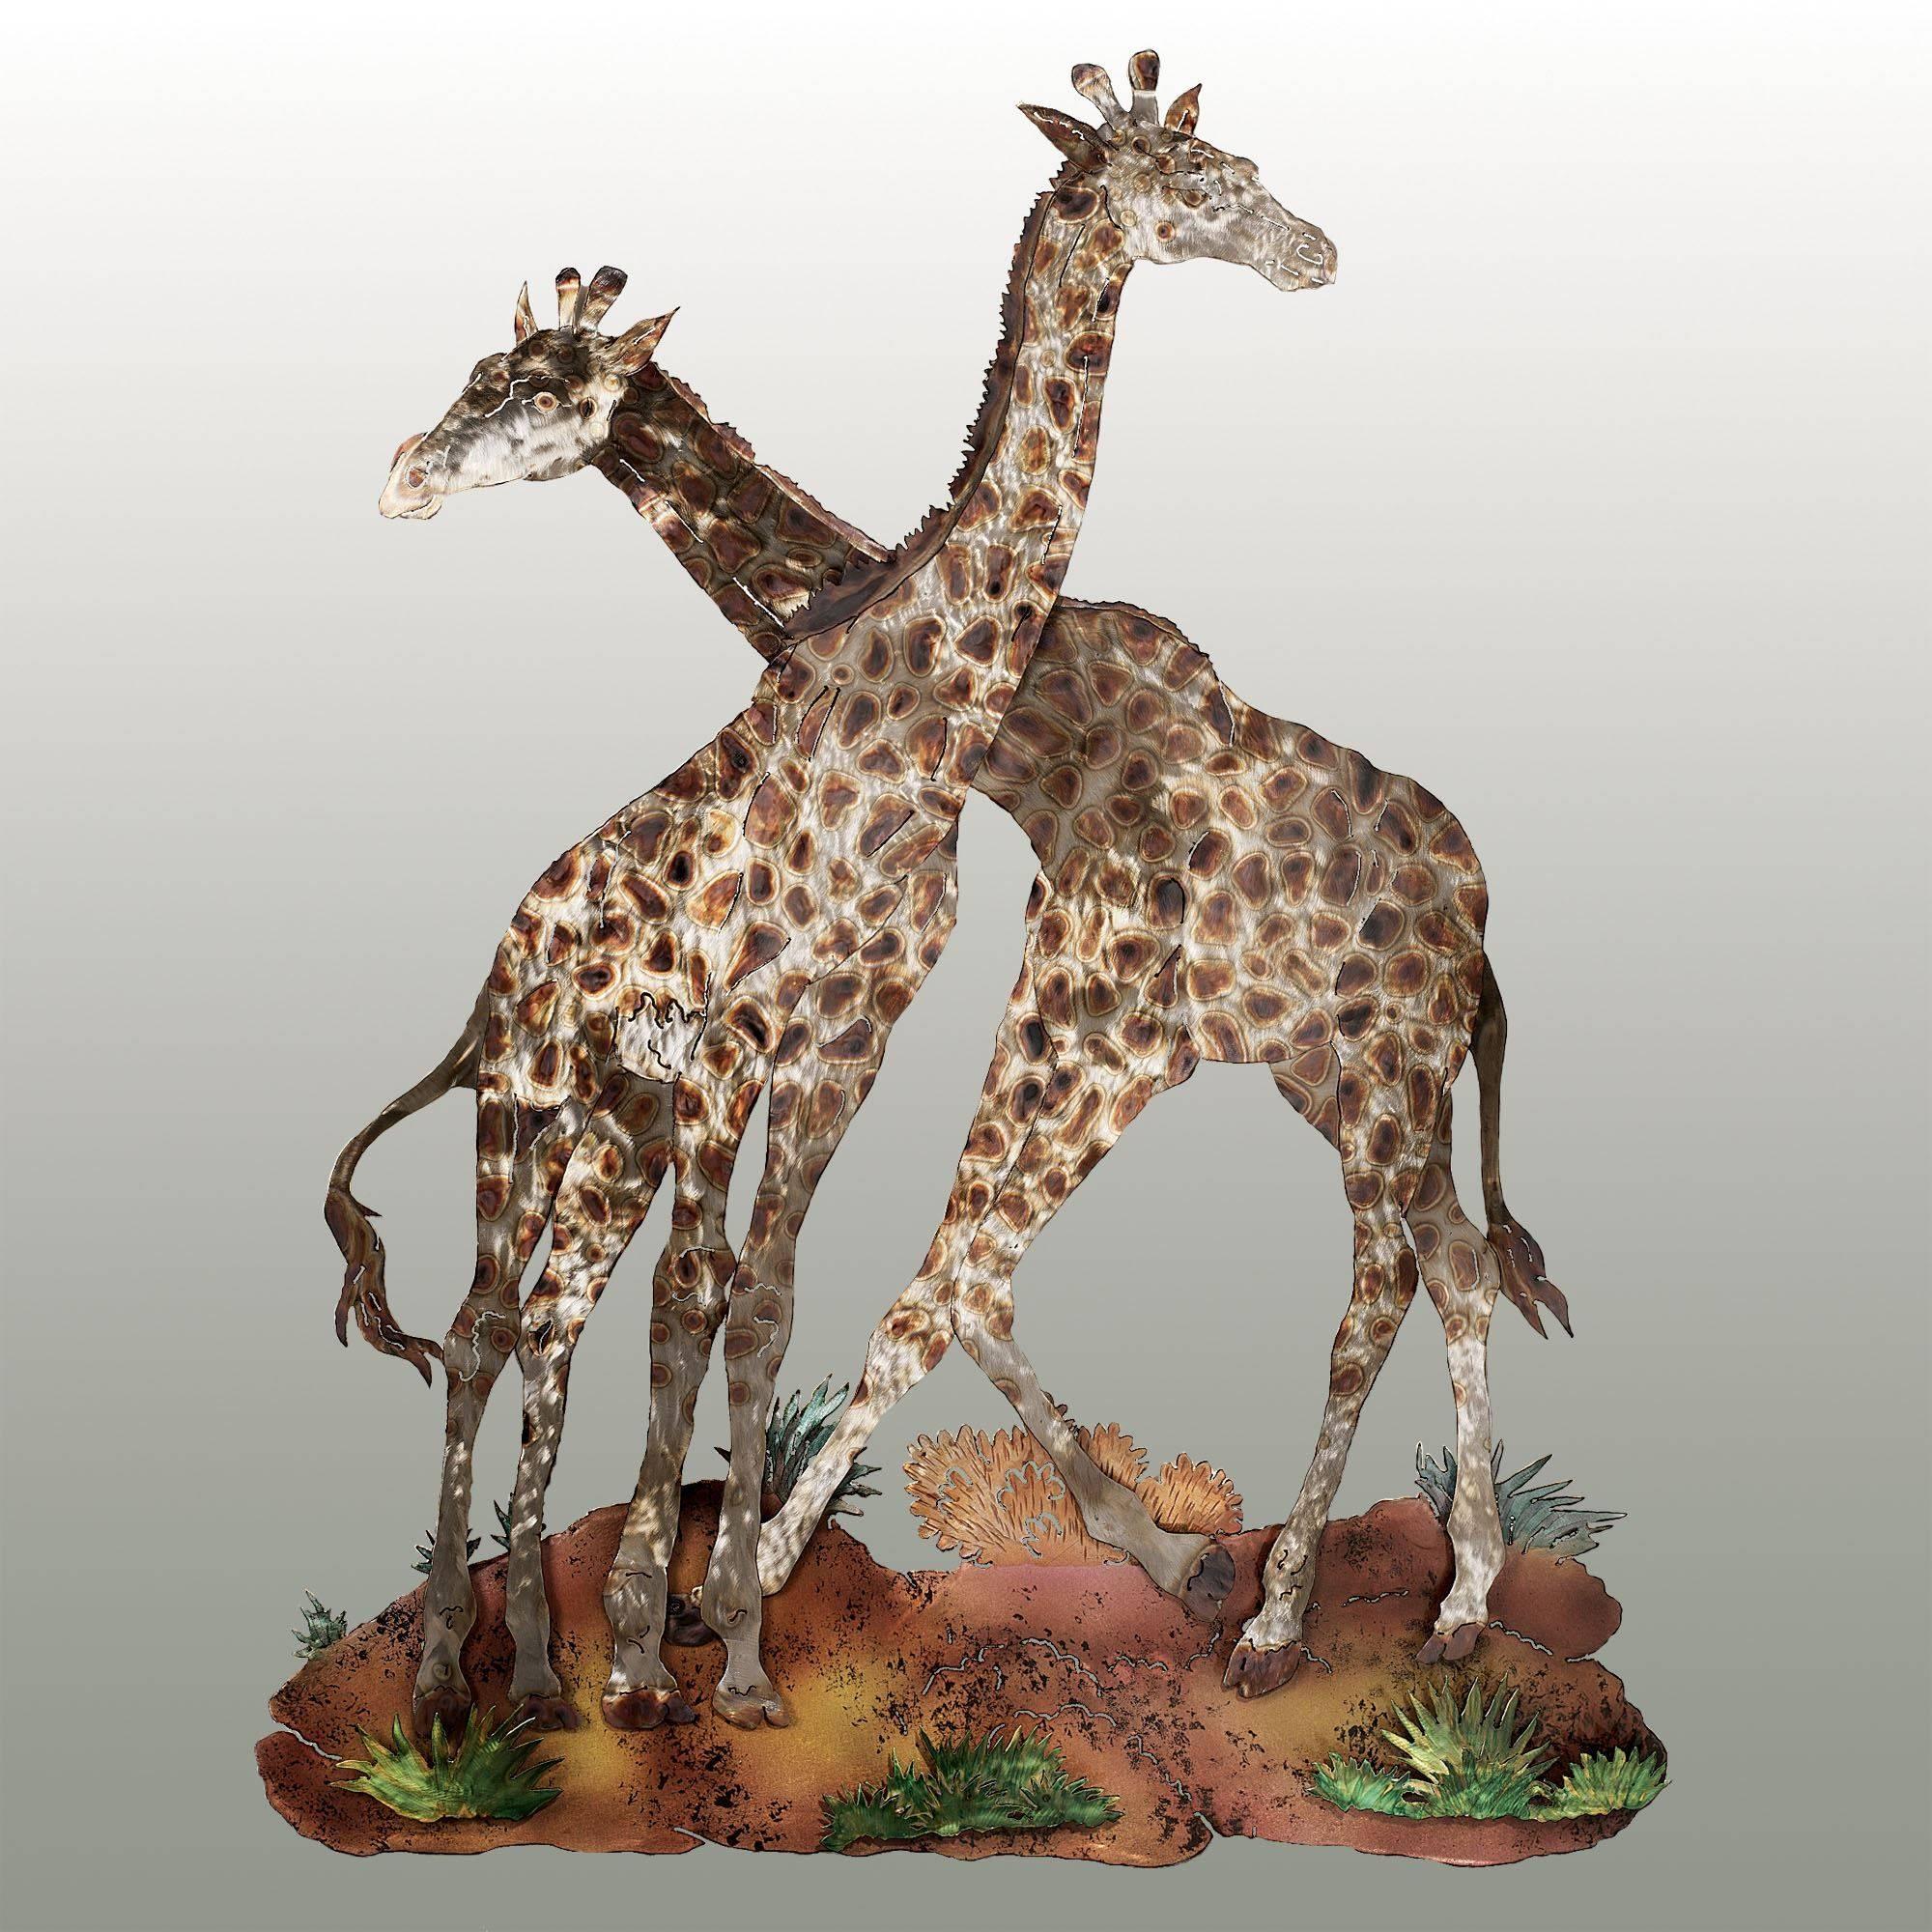 Sahara Pride Giraffe Metal Wall Sculpture Regarding Best And Newest Animal Metal Wall Art (View 13 of 20)